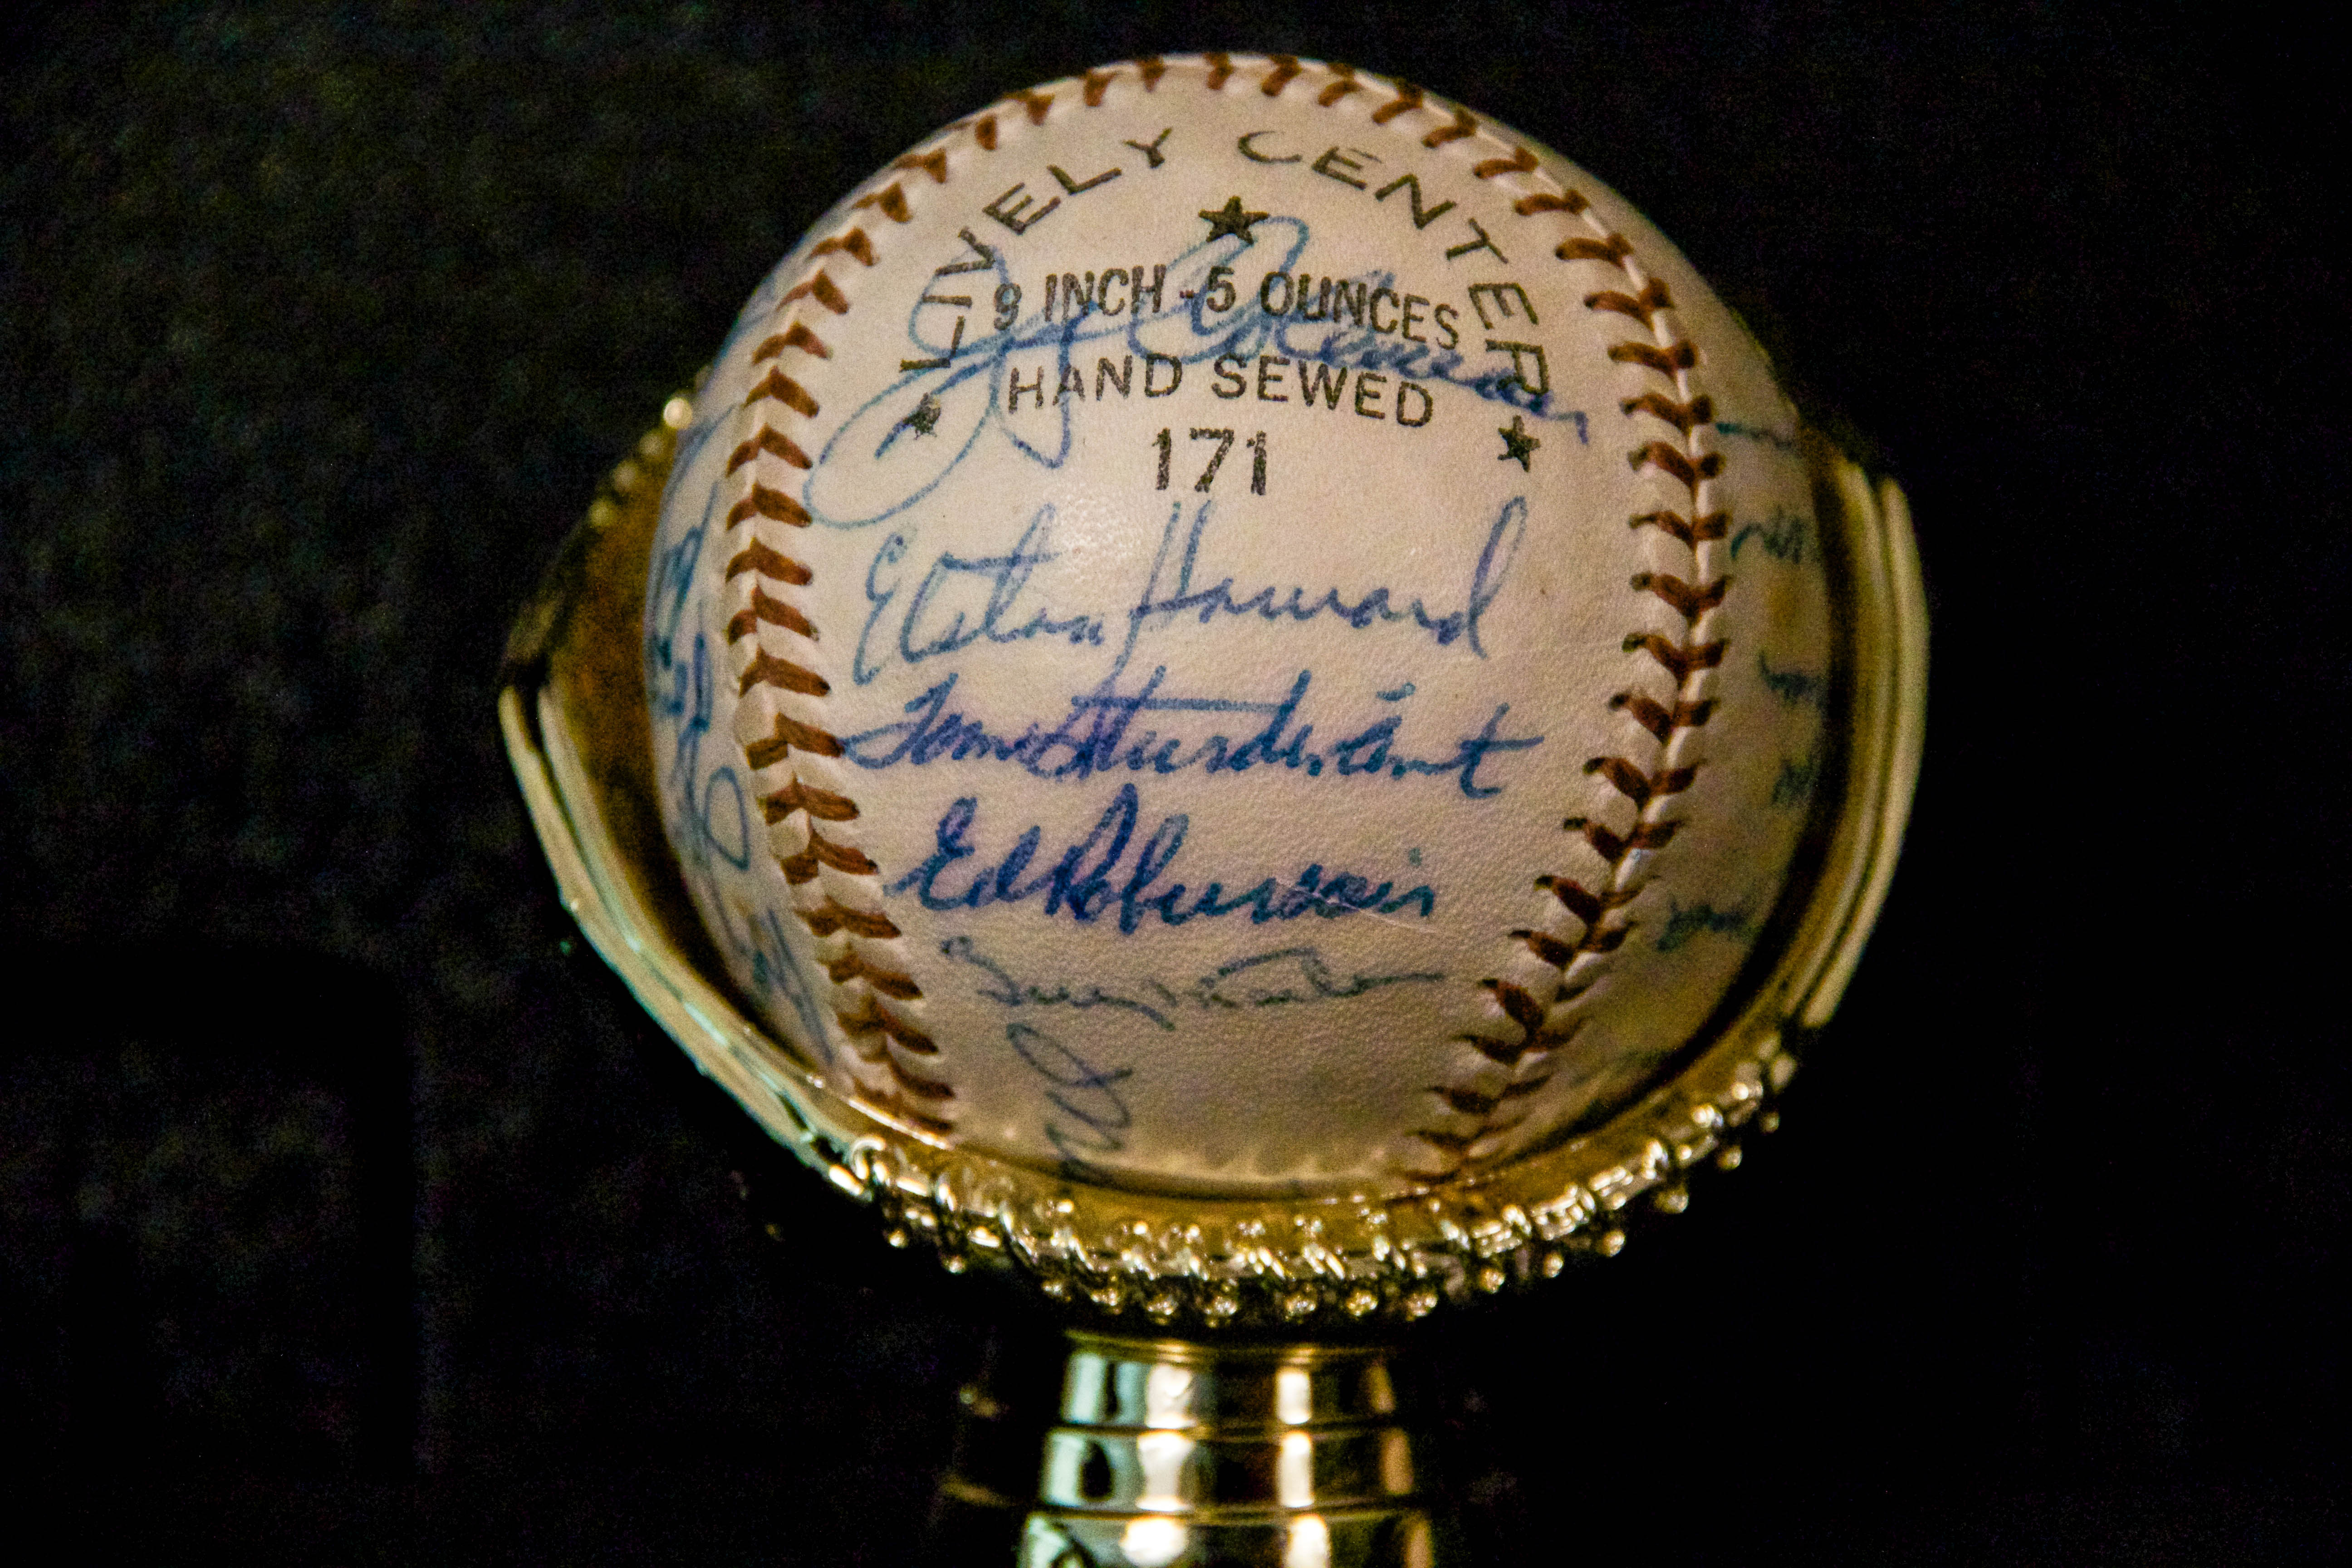 1956 World Series Champions